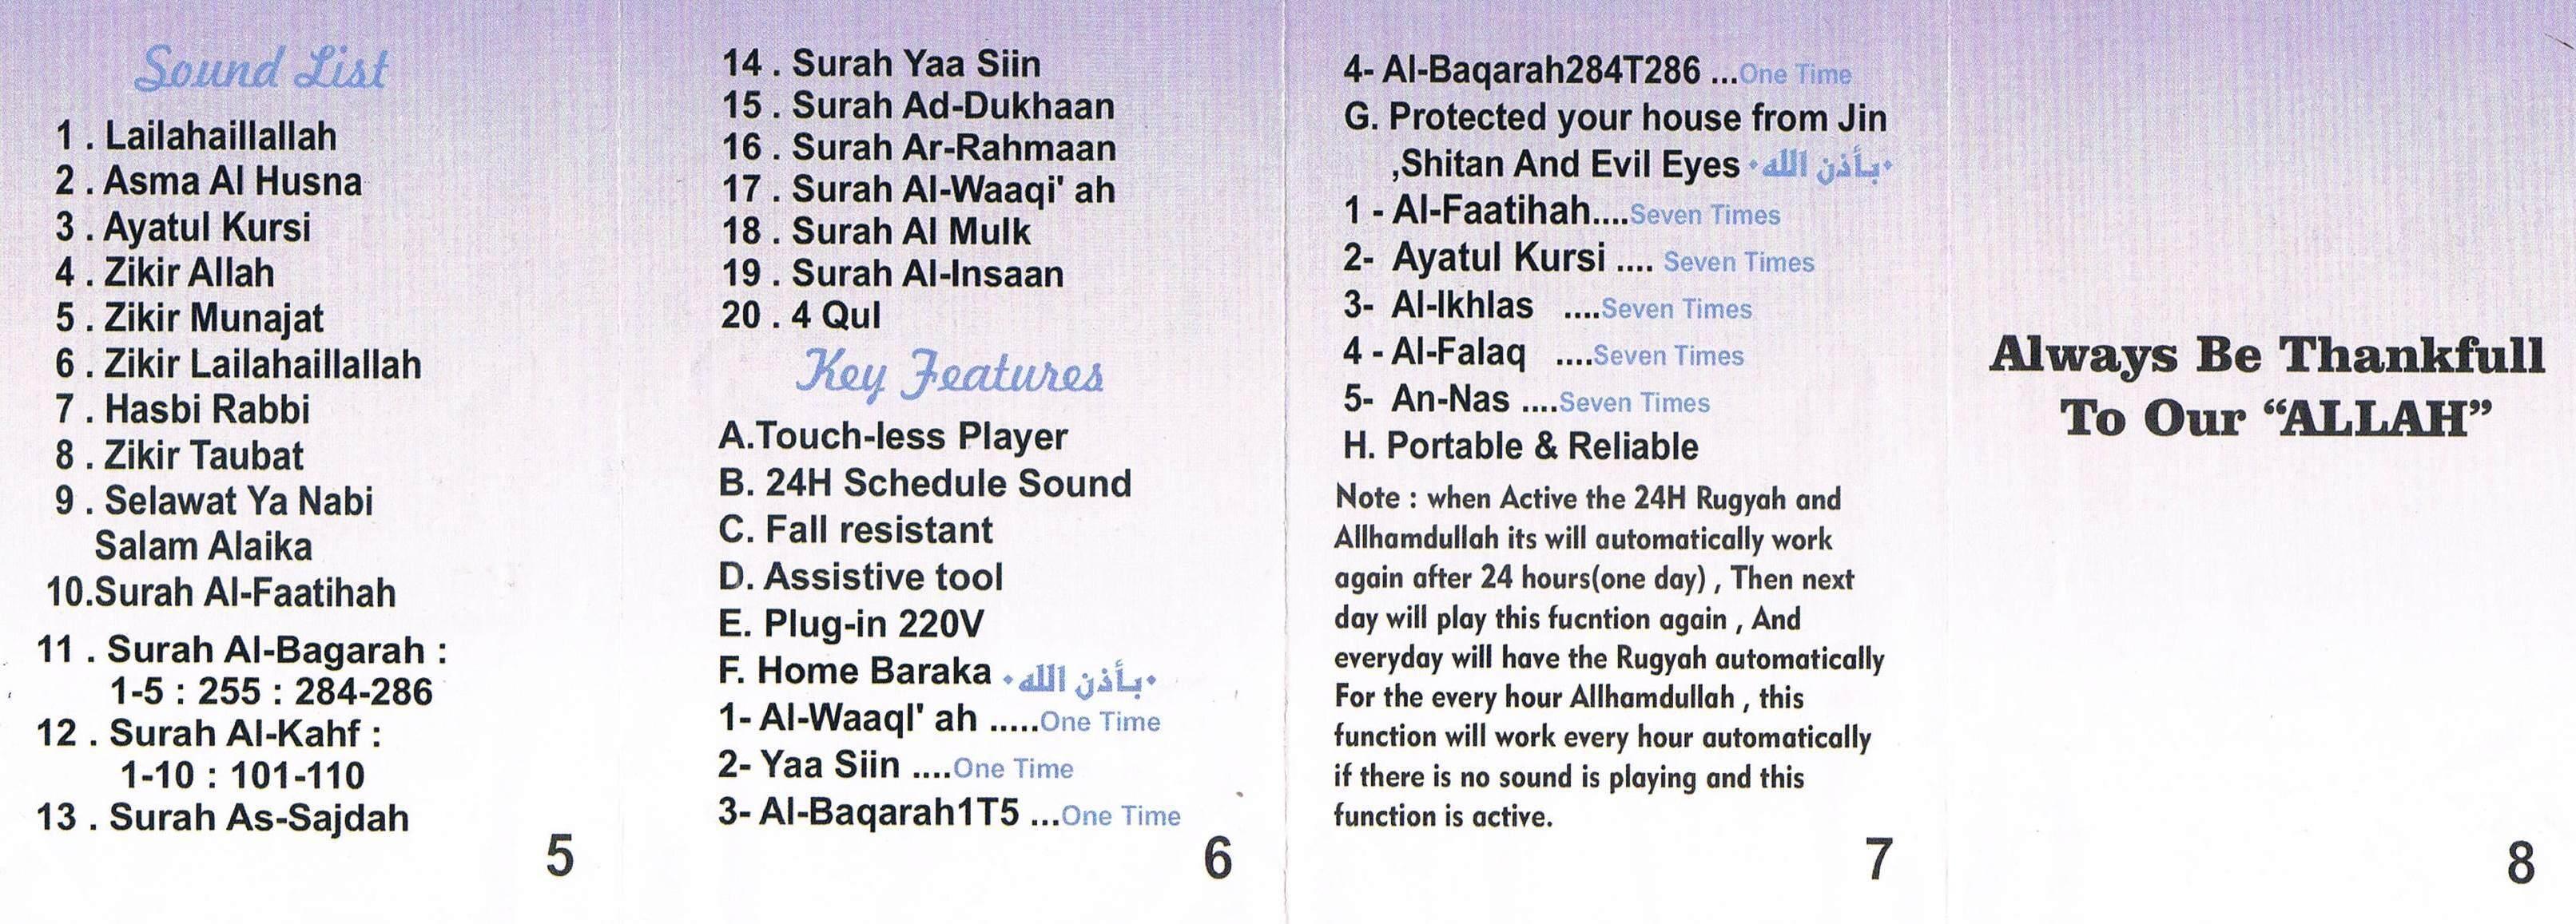 Islam-Rukyah-zikir-player-radio-quran-syariah (4).jpg